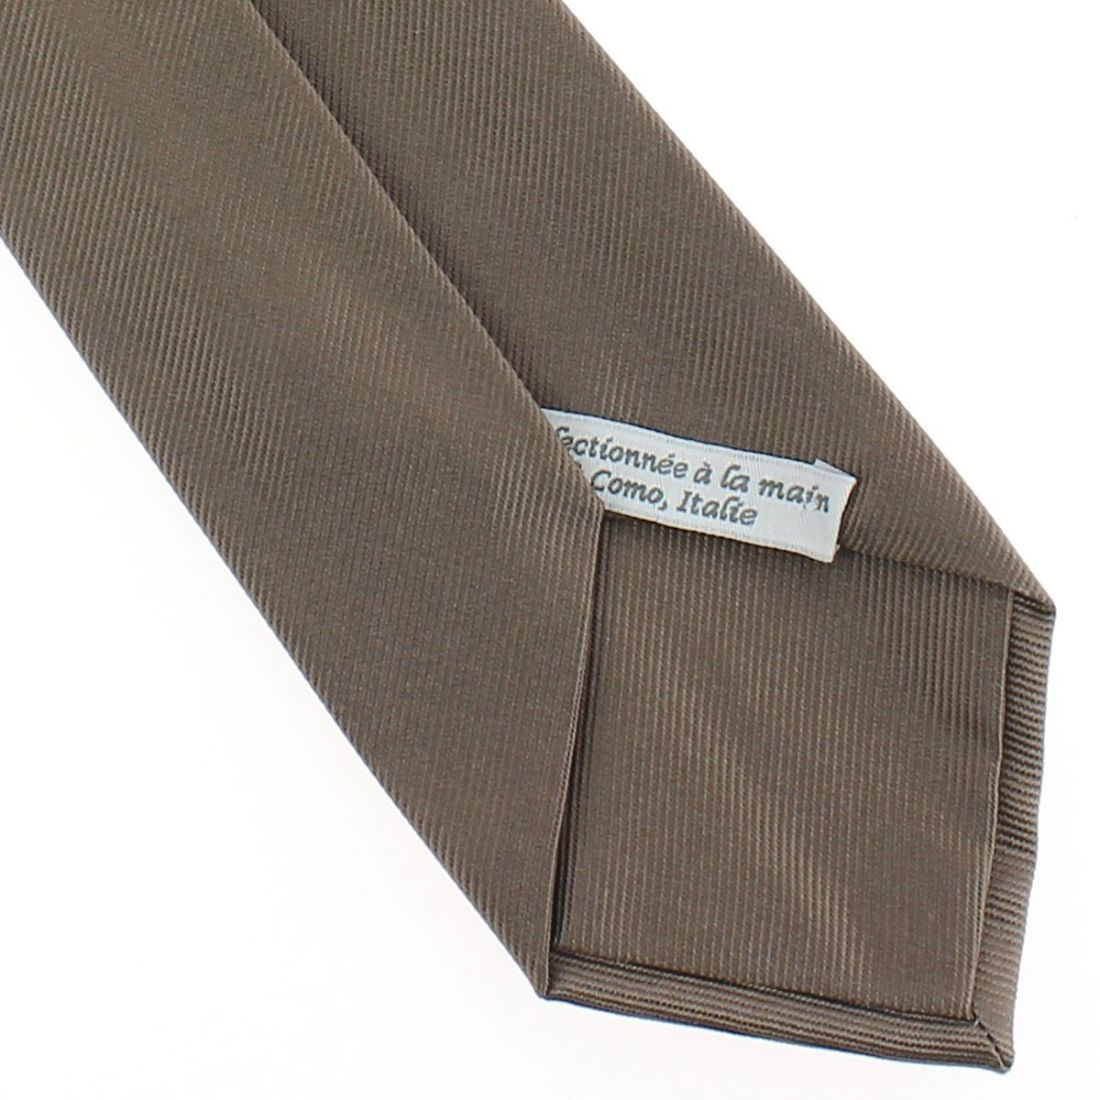 cravate luxe faite la main taupe cravate. Black Bedroom Furniture Sets. Home Design Ideas